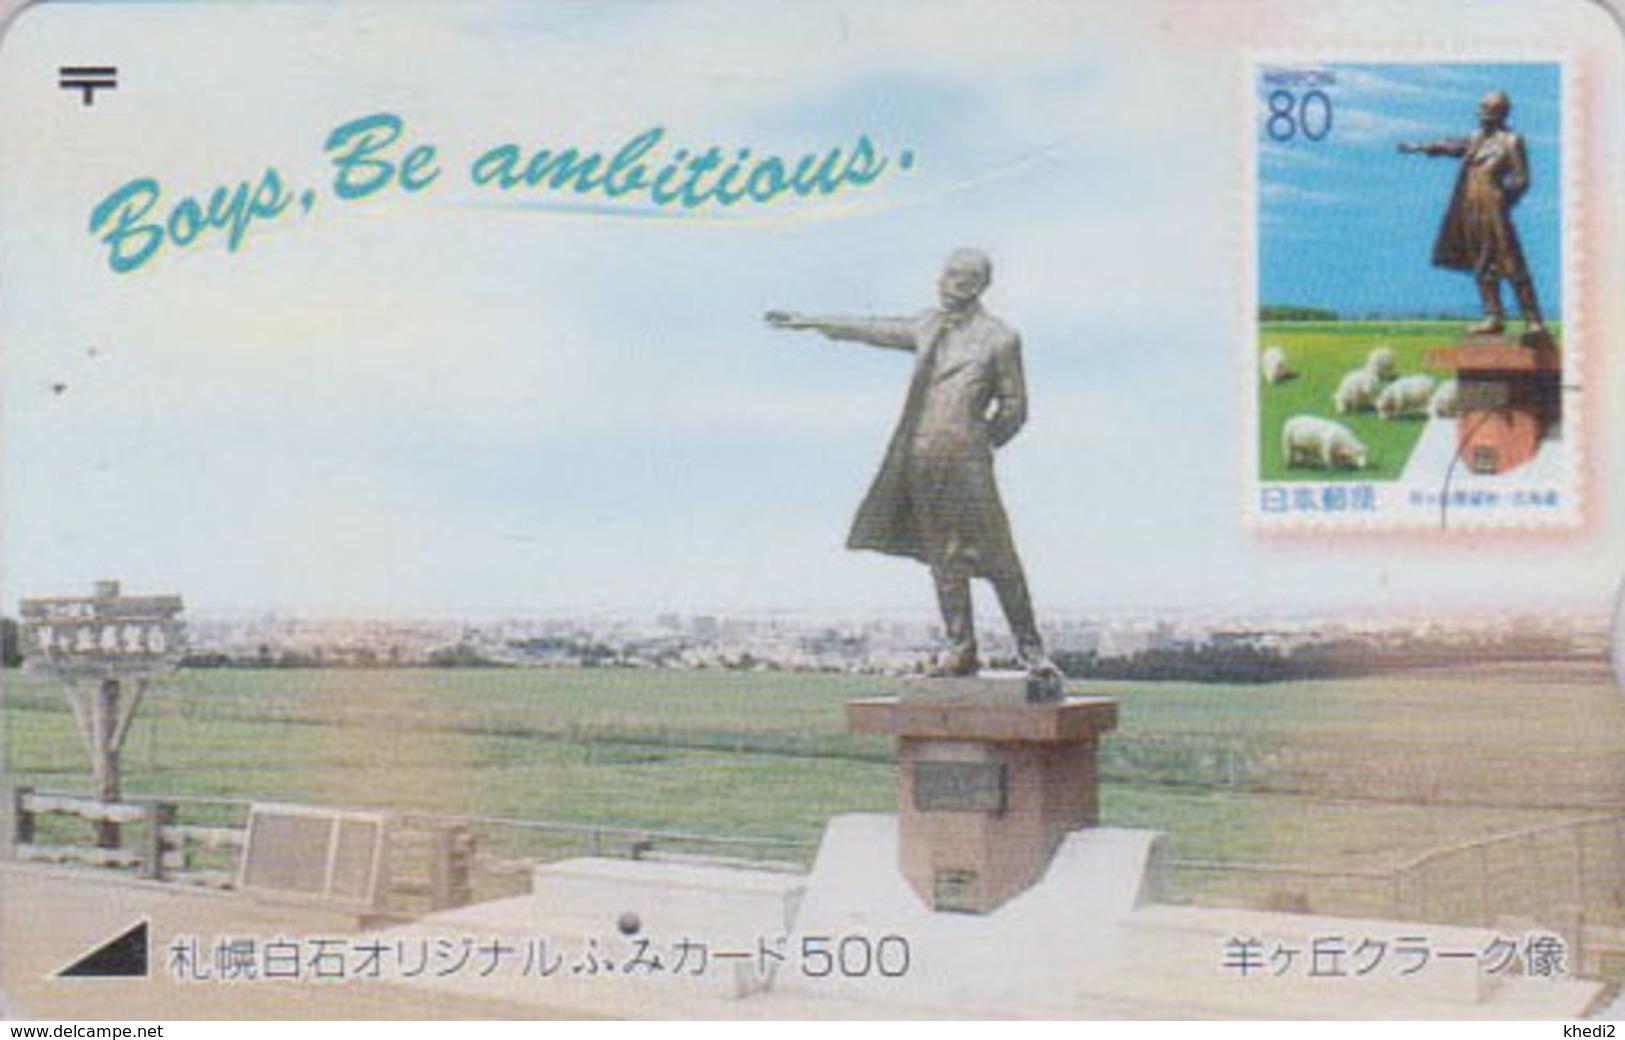 Carte Prépayée Japon - TIMBRE & Animal Mouton - Sheep STAMP On Japan Prepaid Fumi Card - Schaf Auf BRIEFMARKE  - 146 - Timbres & Monnaies